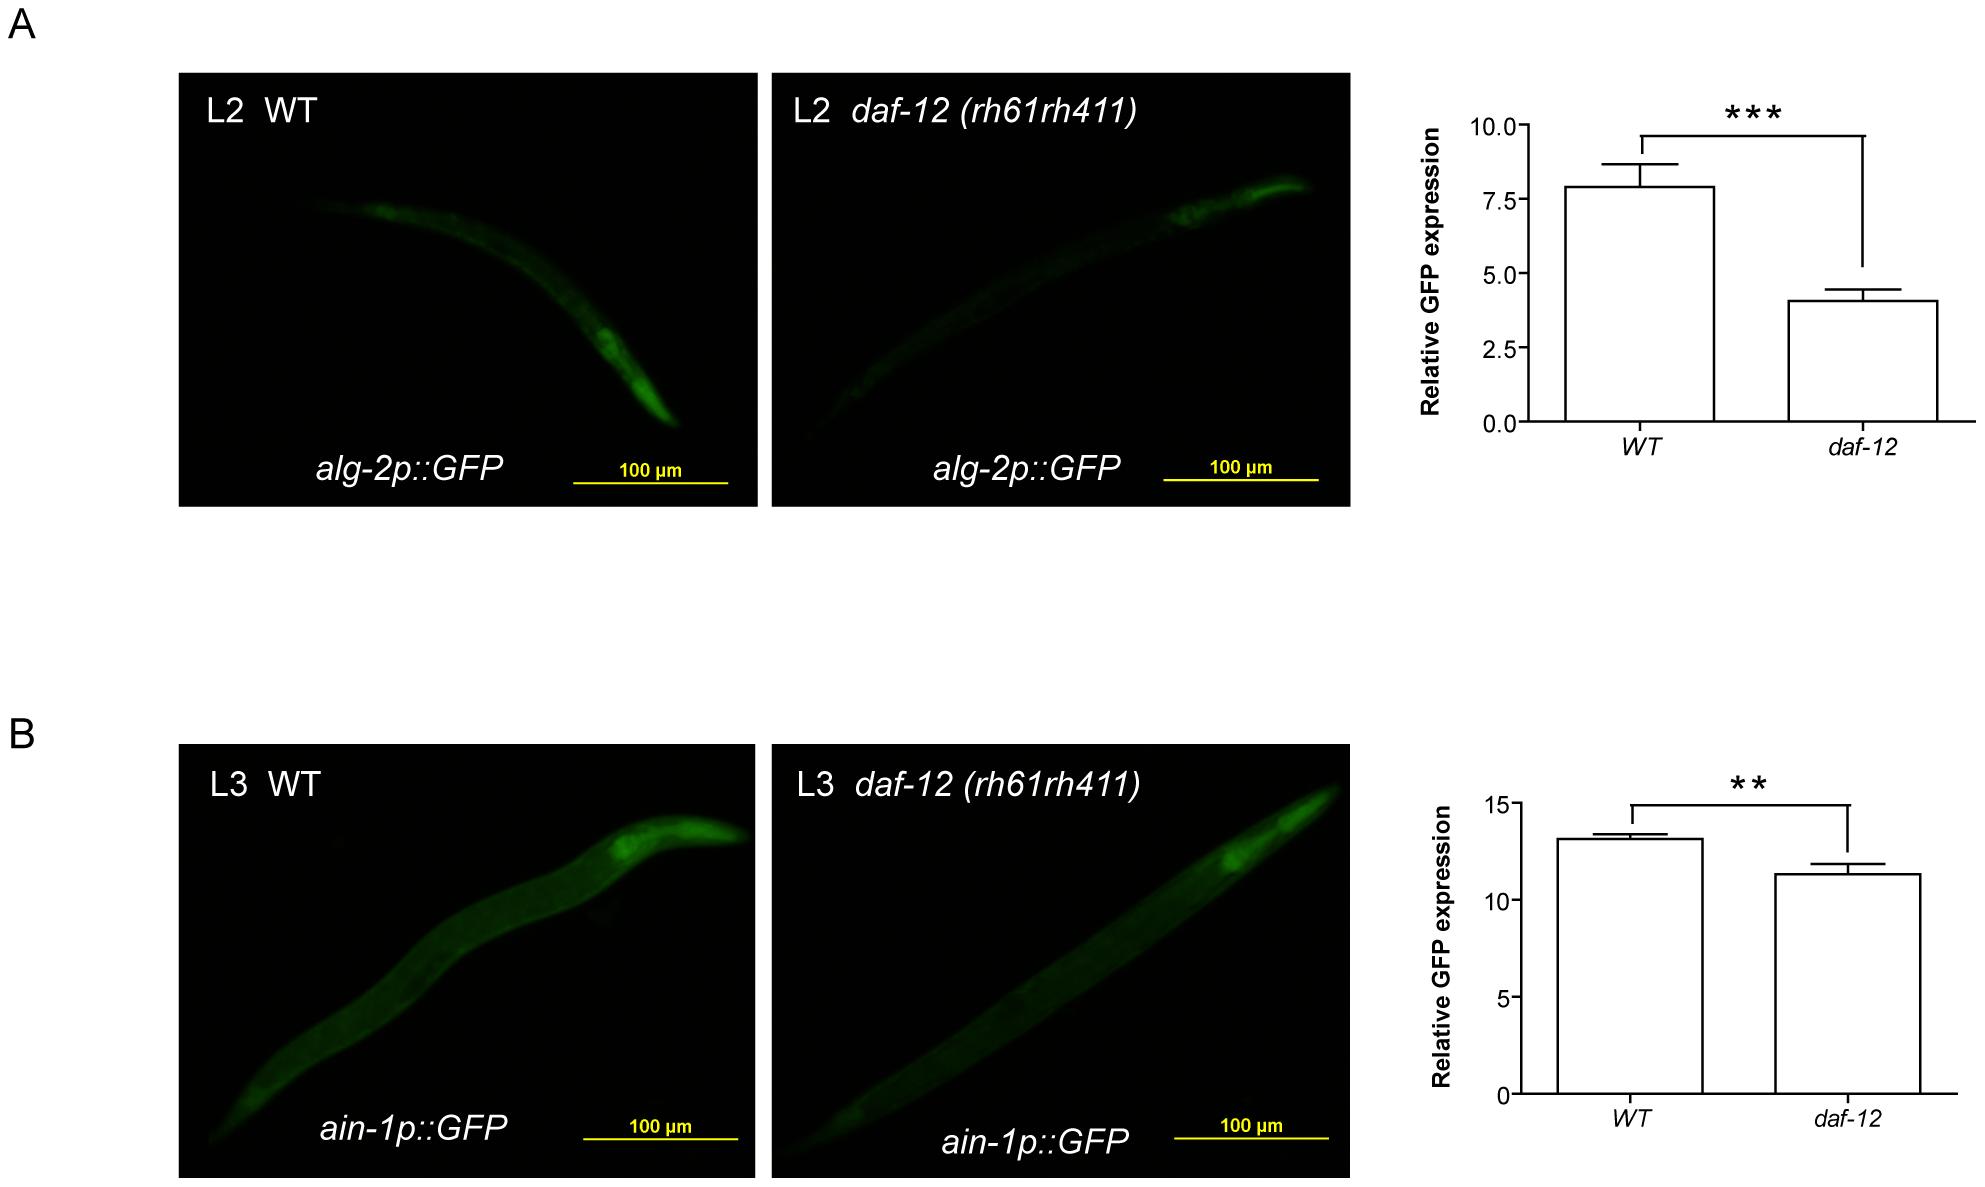 DAF-12 regulates expression of miRISC genes.